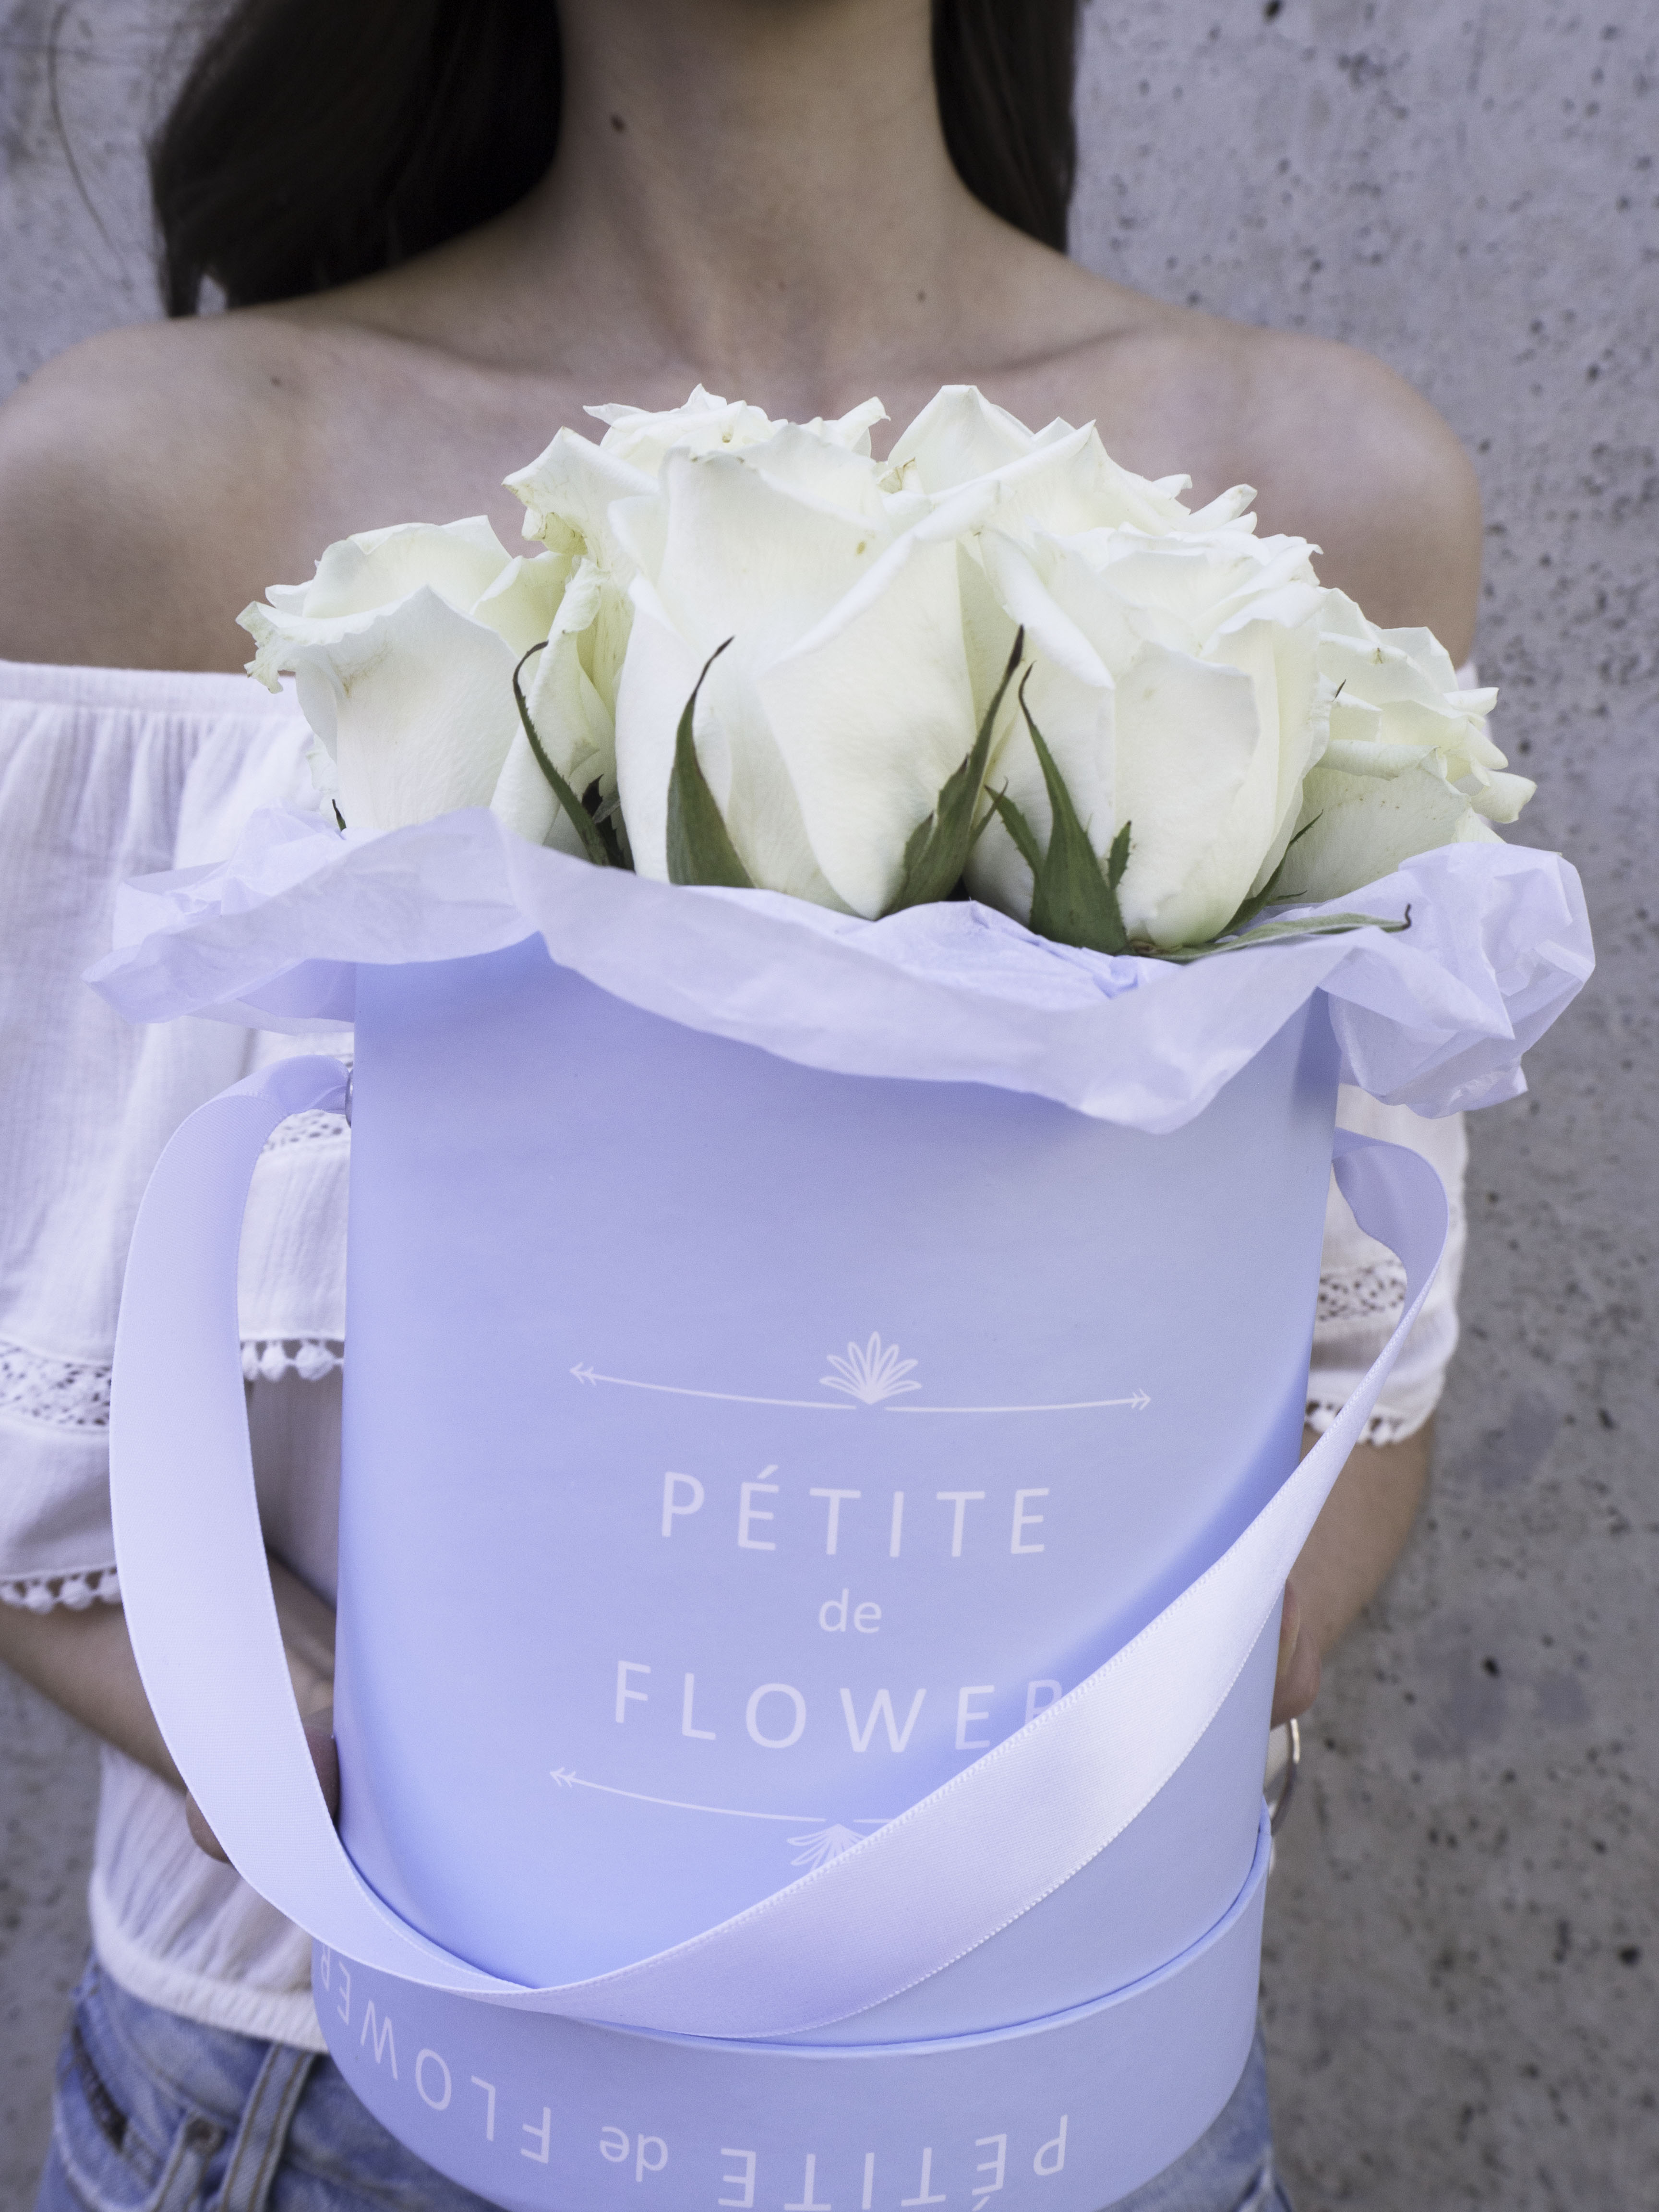 Petite de Flower 11